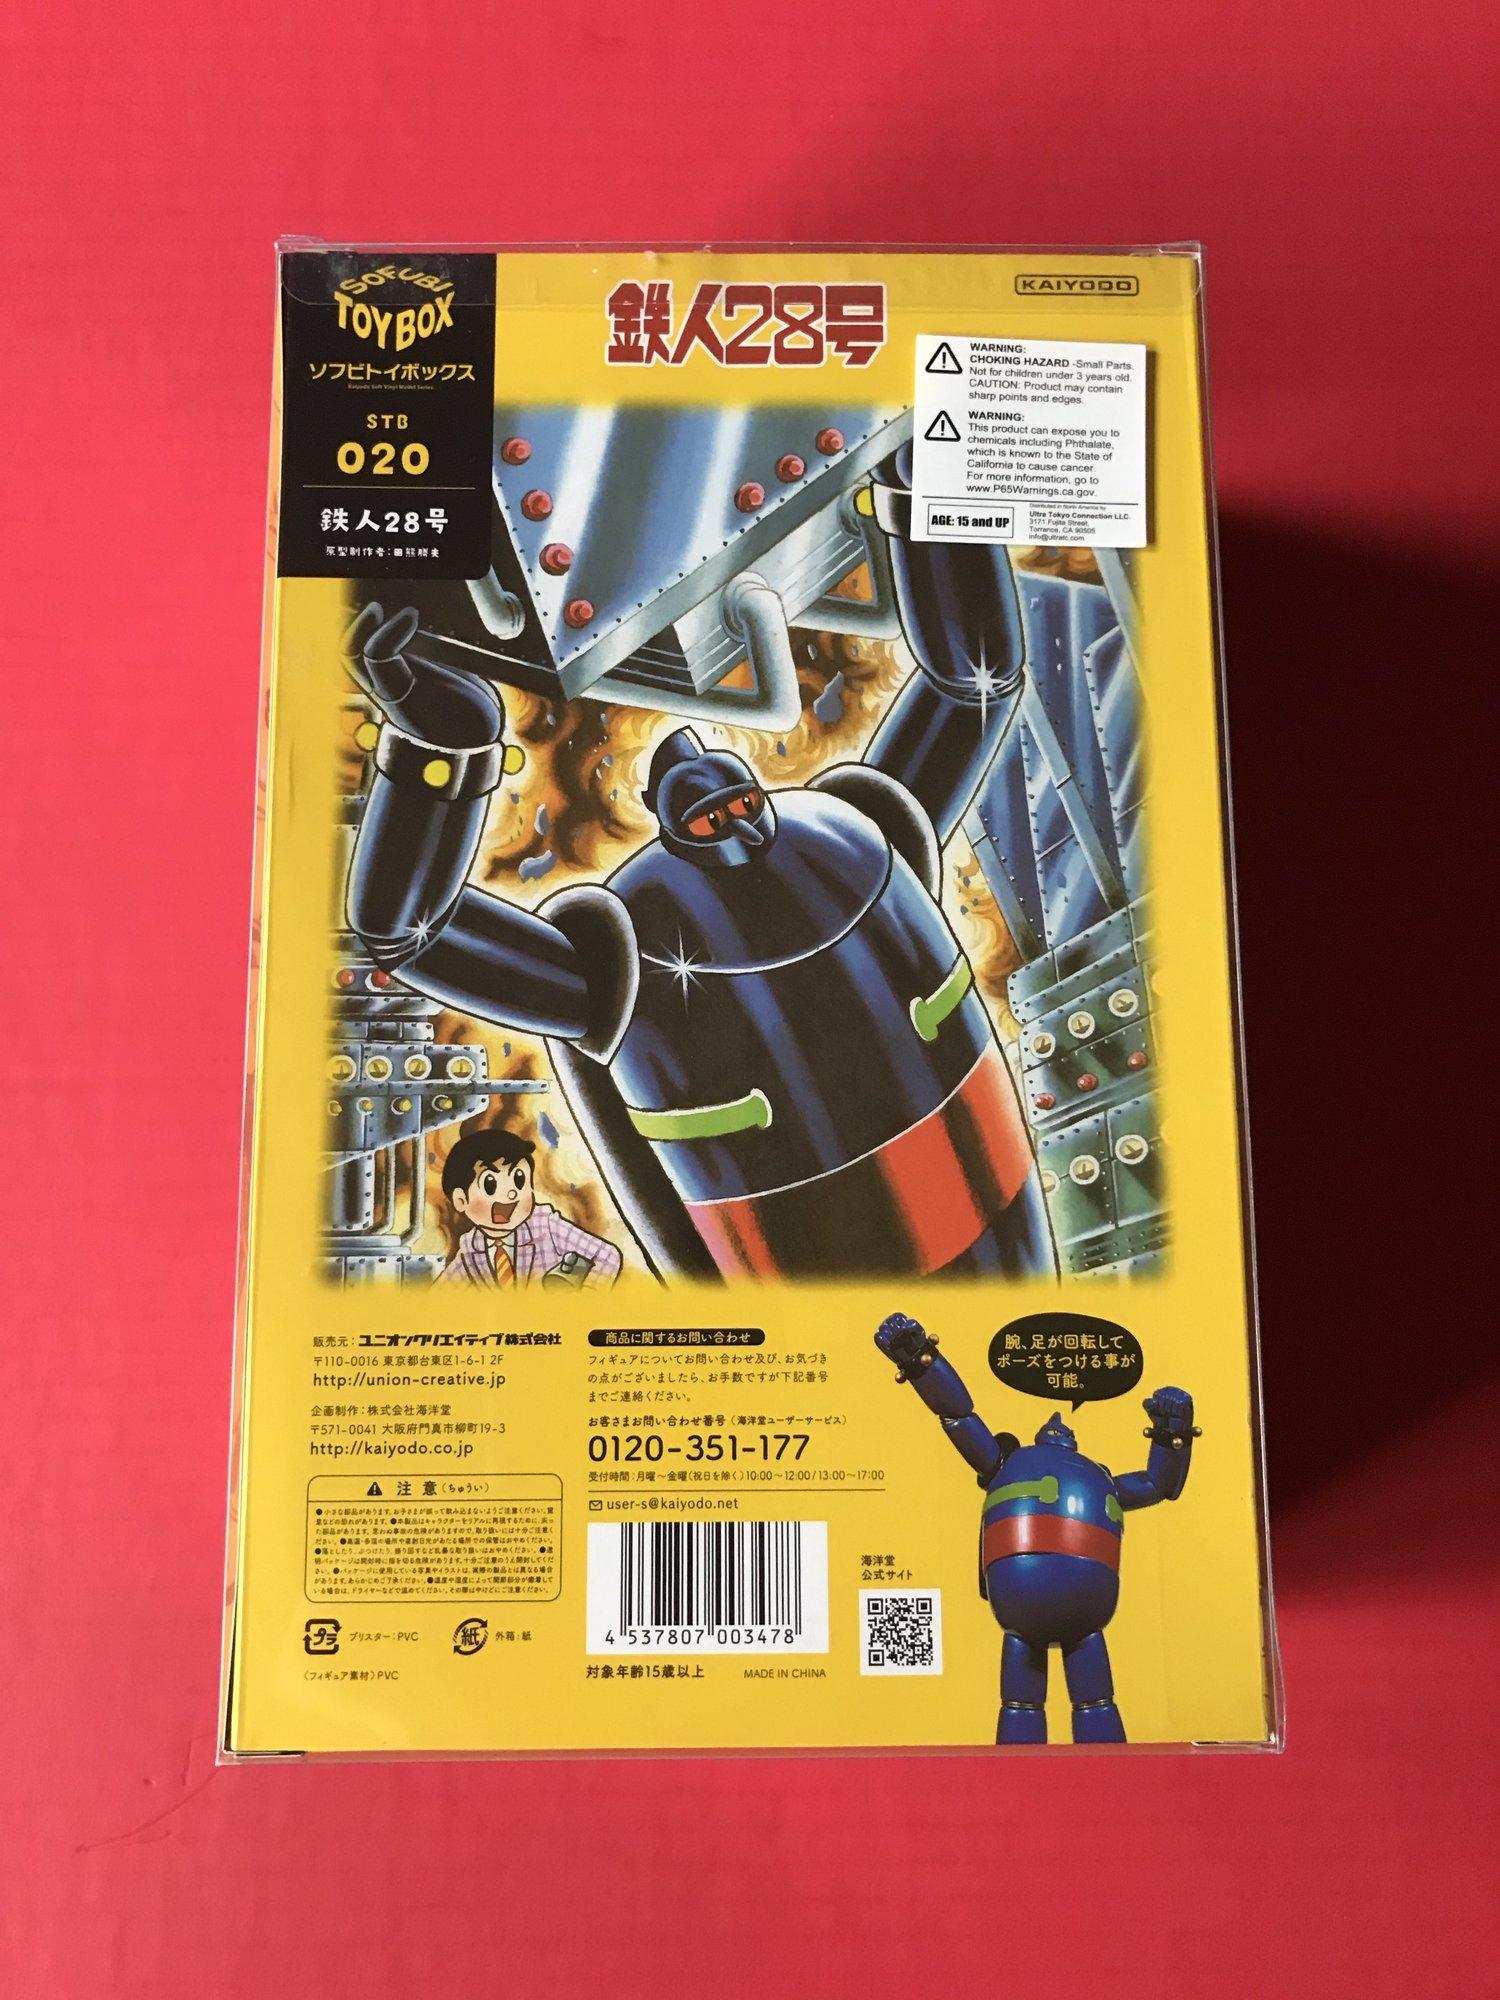 Sofubi Toy Box 020 Tetsujin 28-go Gigantor Full Color Action Figure by Kaiyodo